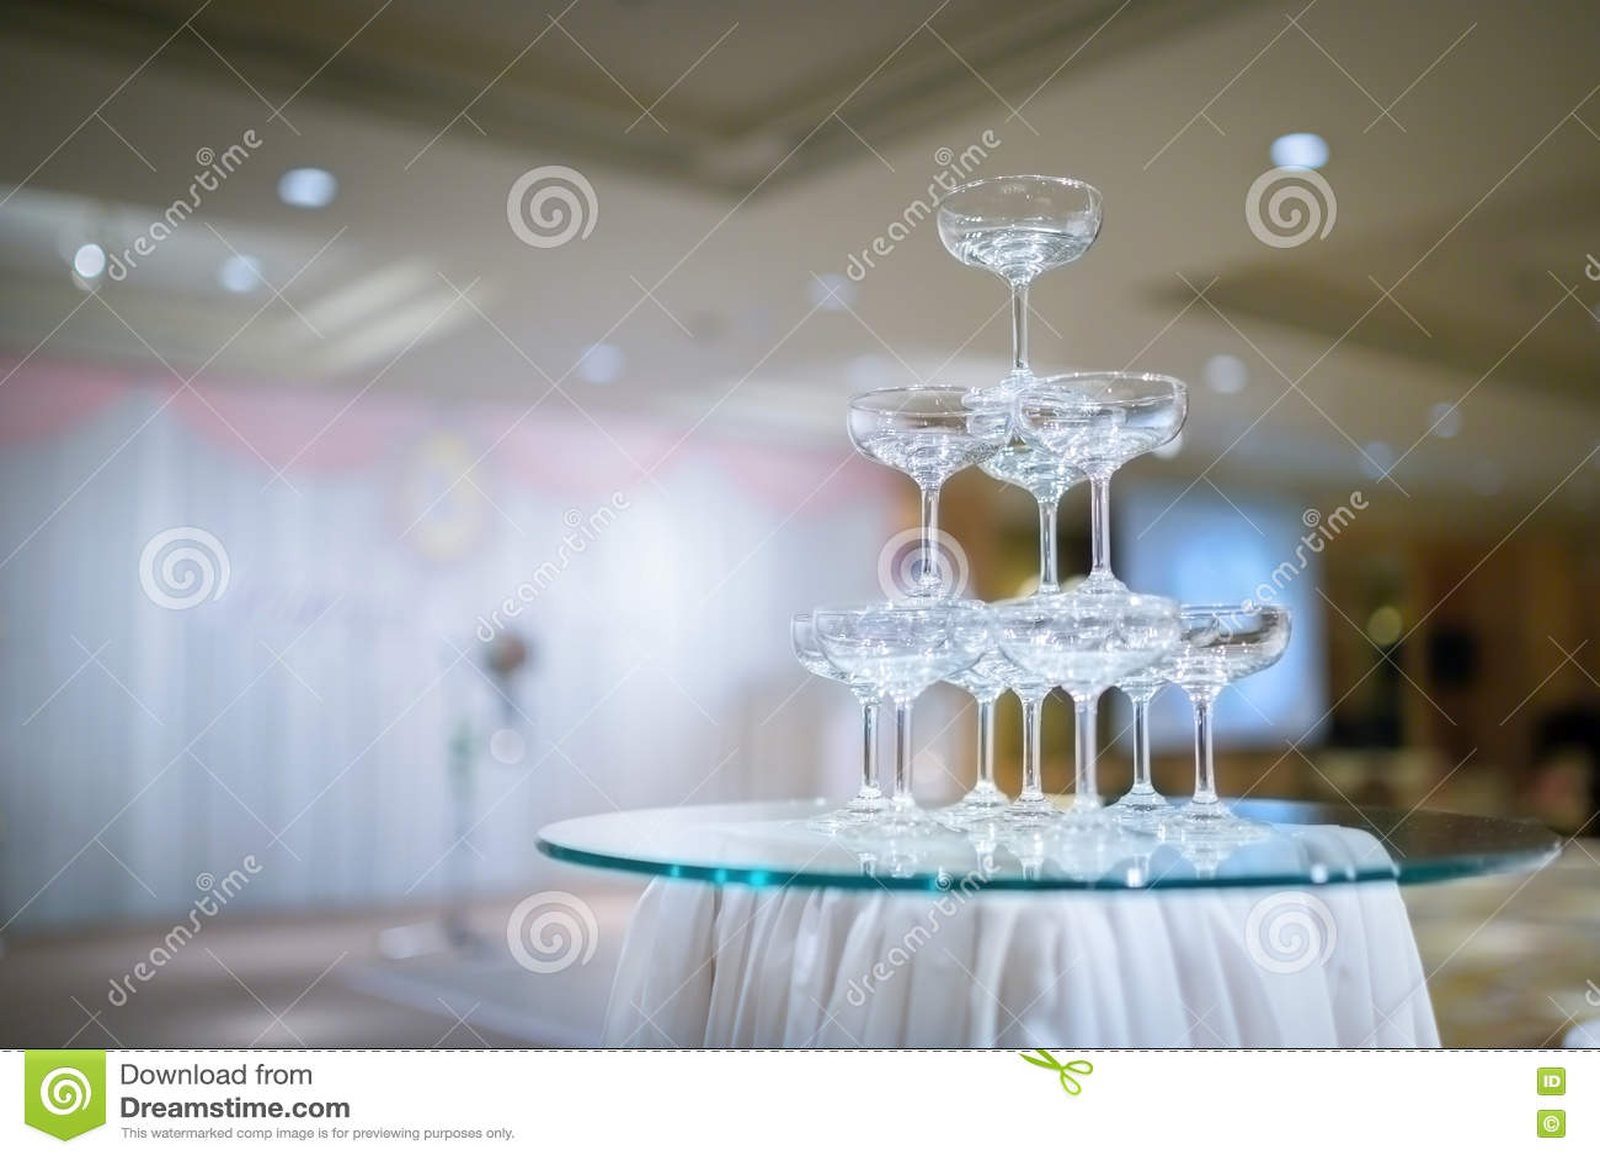 Torre de Champán en ceremonia de boda - Foco selectivo